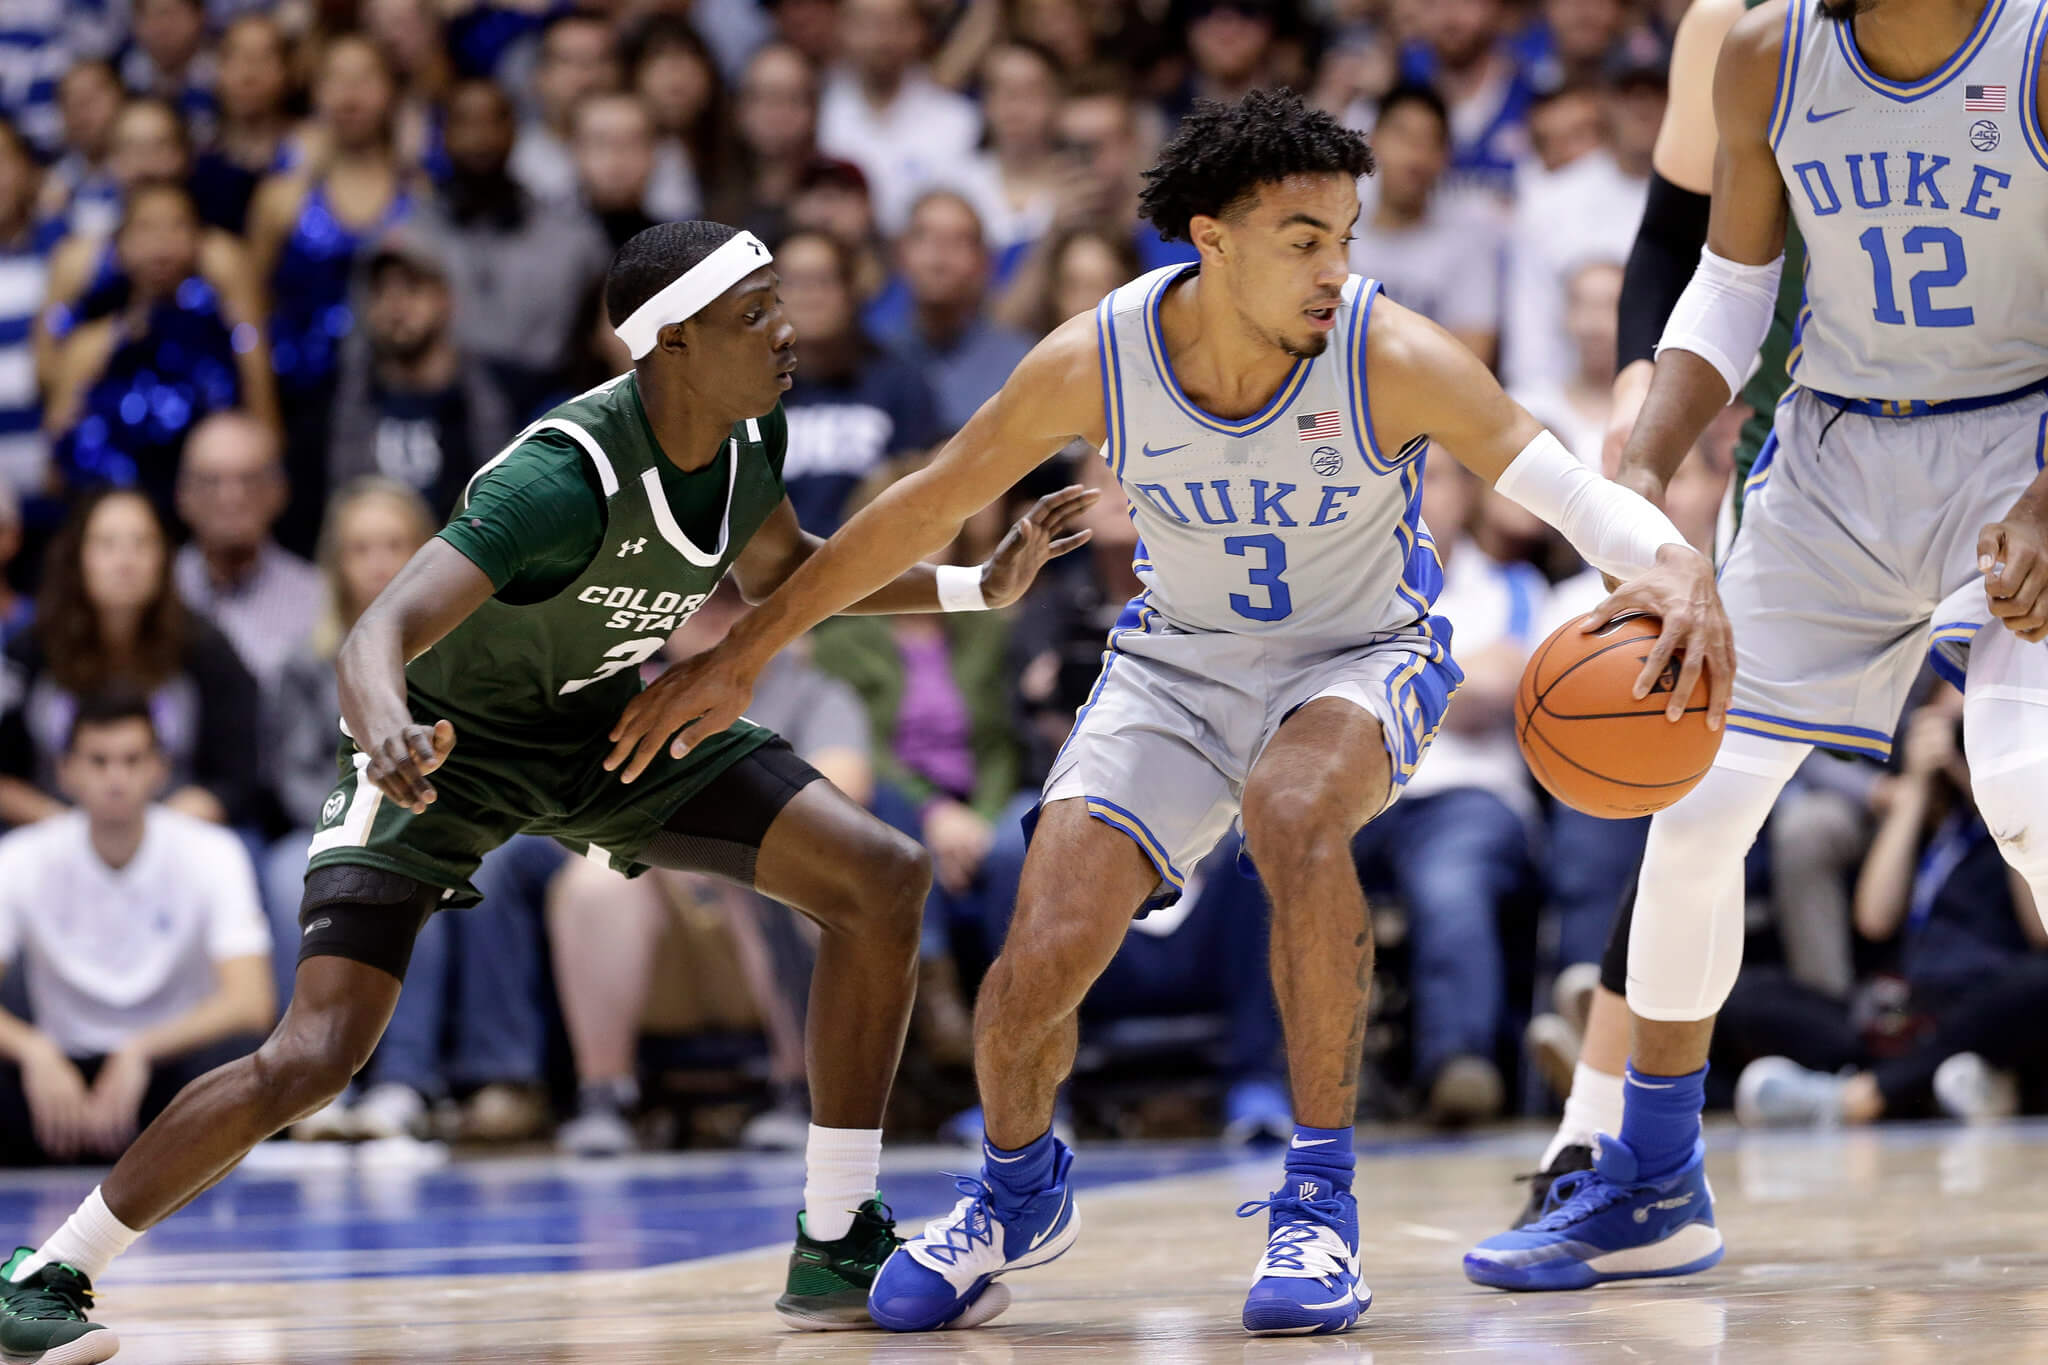 NCAA Basketball Final Four Odds